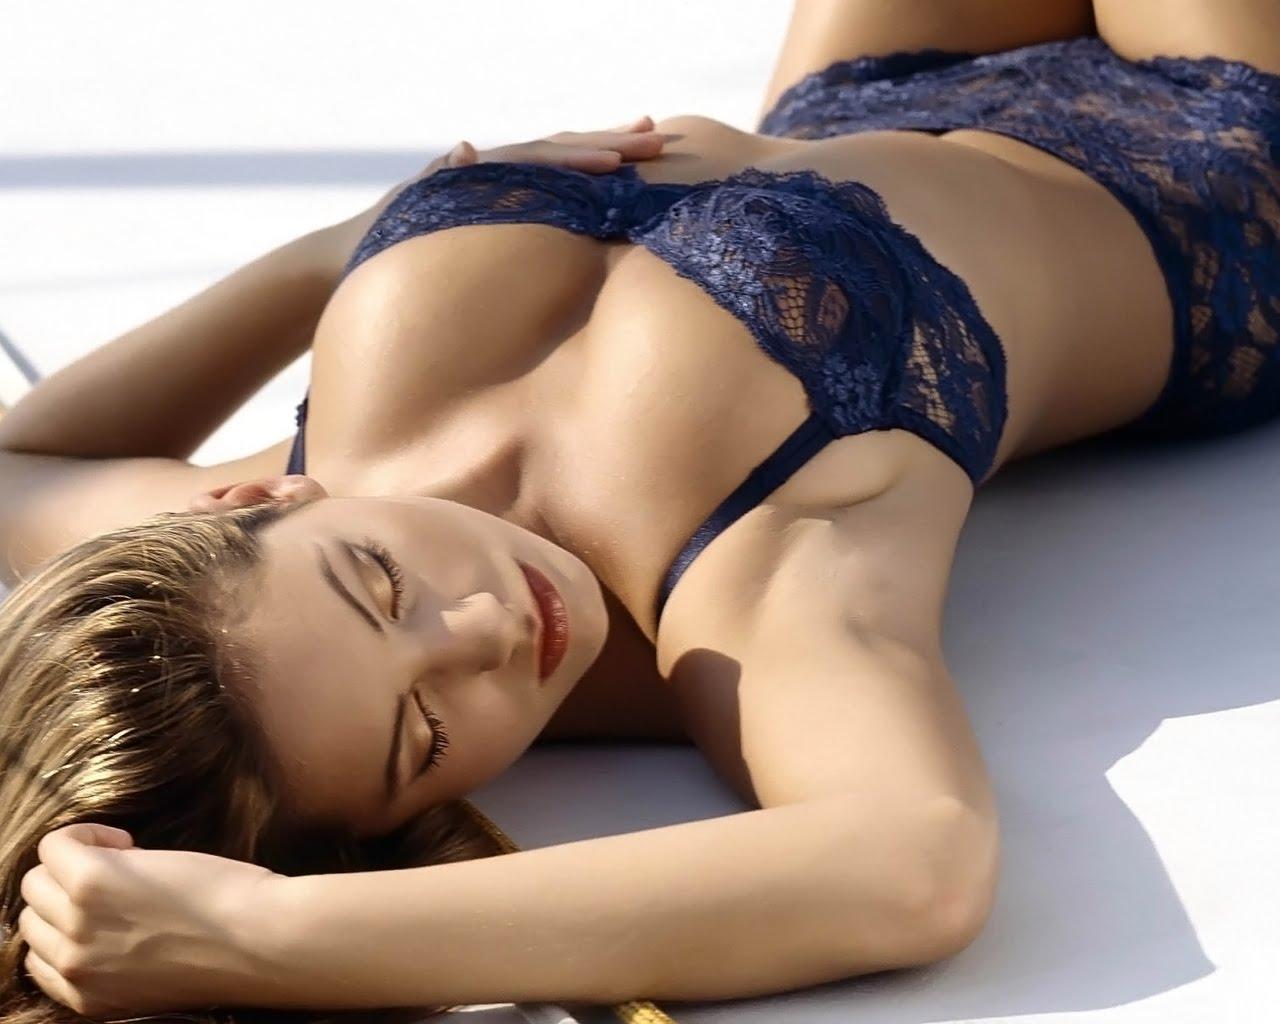 http://3.bp.blogspot.com/-u0QWpGCLRQ8/Tcm7Dph5yPI/AAAAAAAAMHs/6MYYvuxSu_0/s1600/Kelly%2BBrook3.jpg